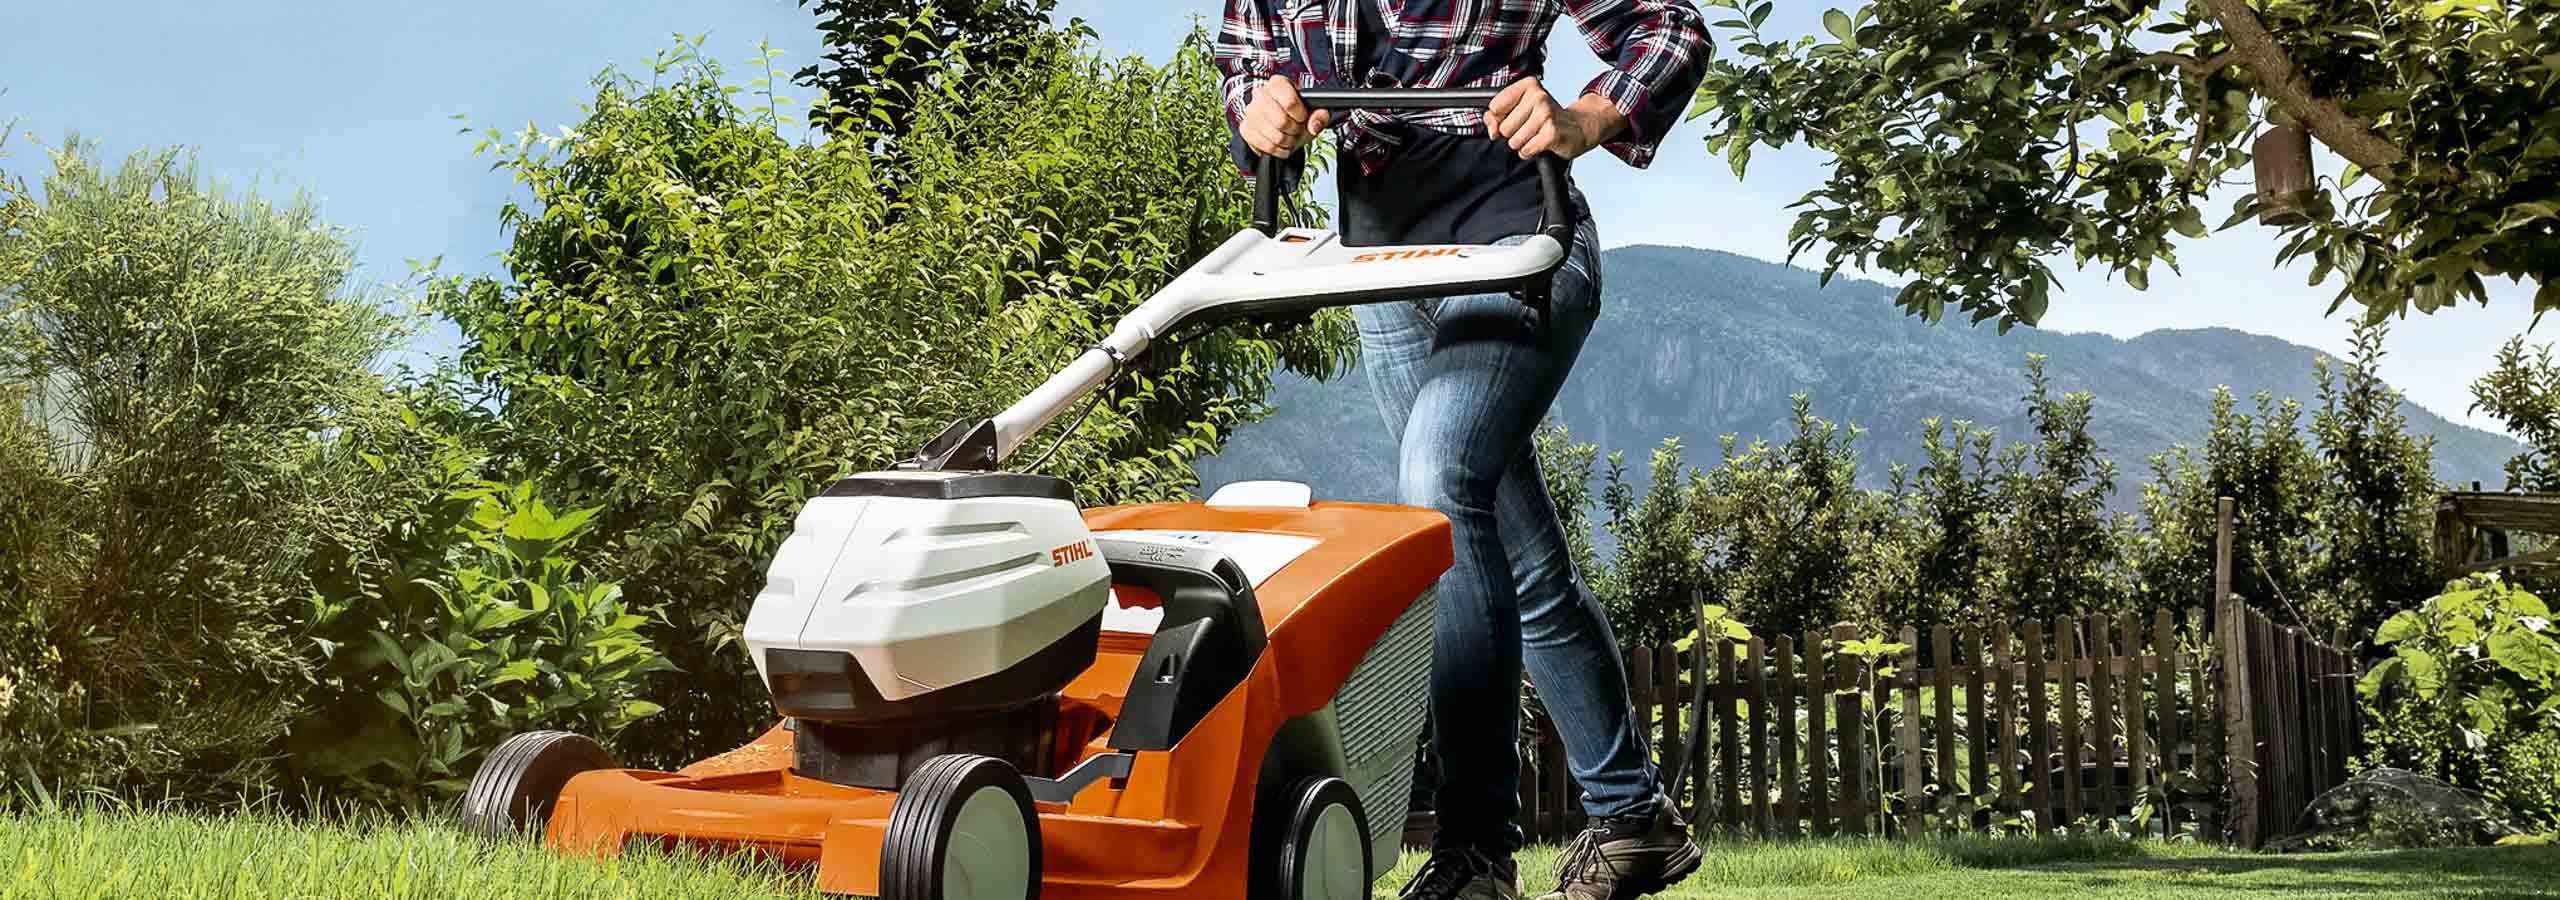 STIHL Grünflächenpflege